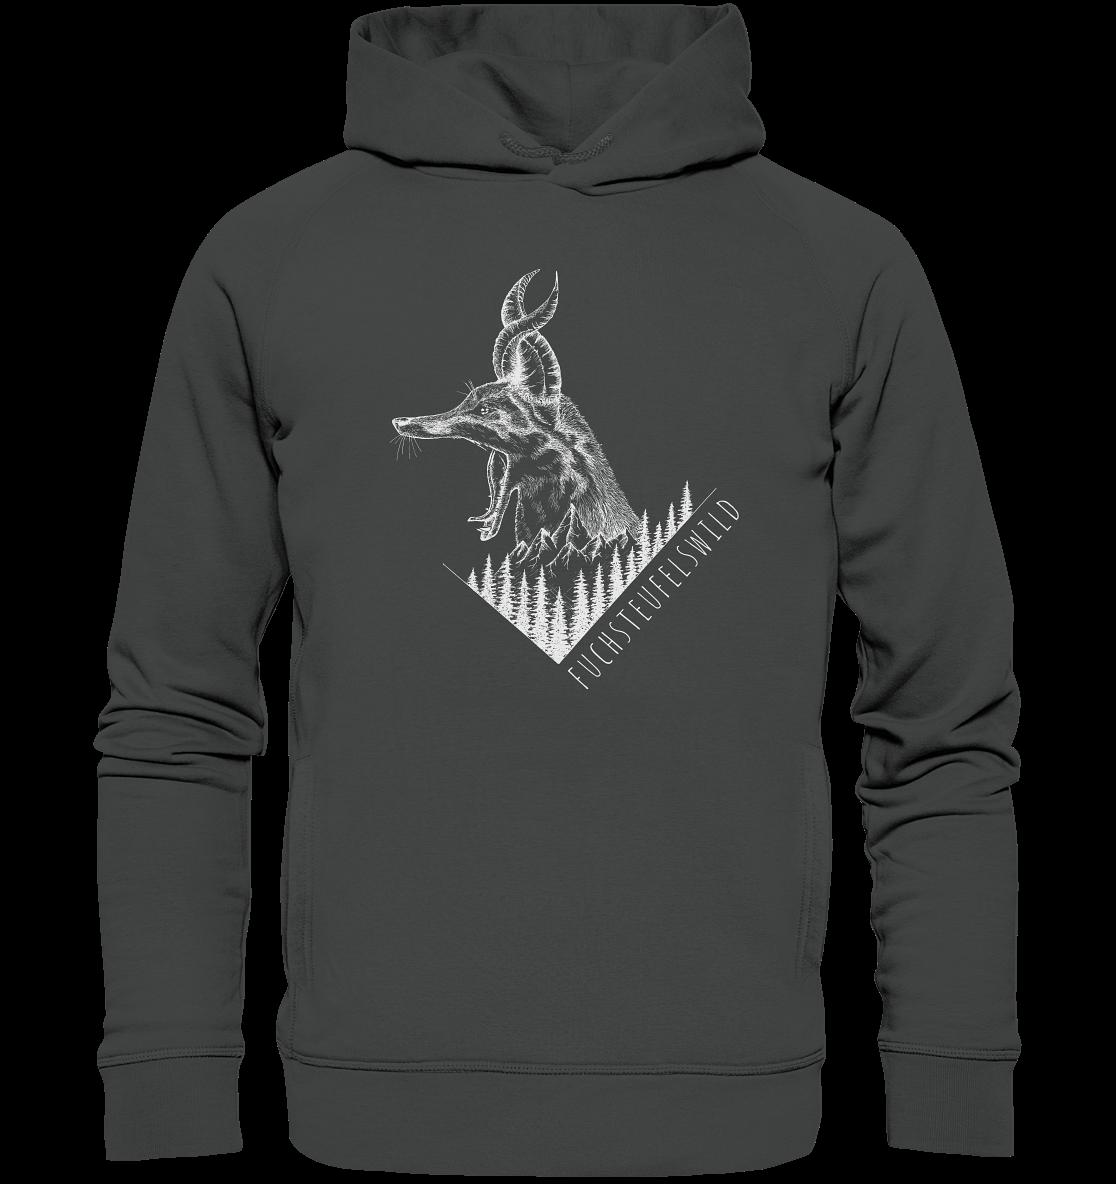 front-organic-fashion-hoodie-444545-1116x-3.png